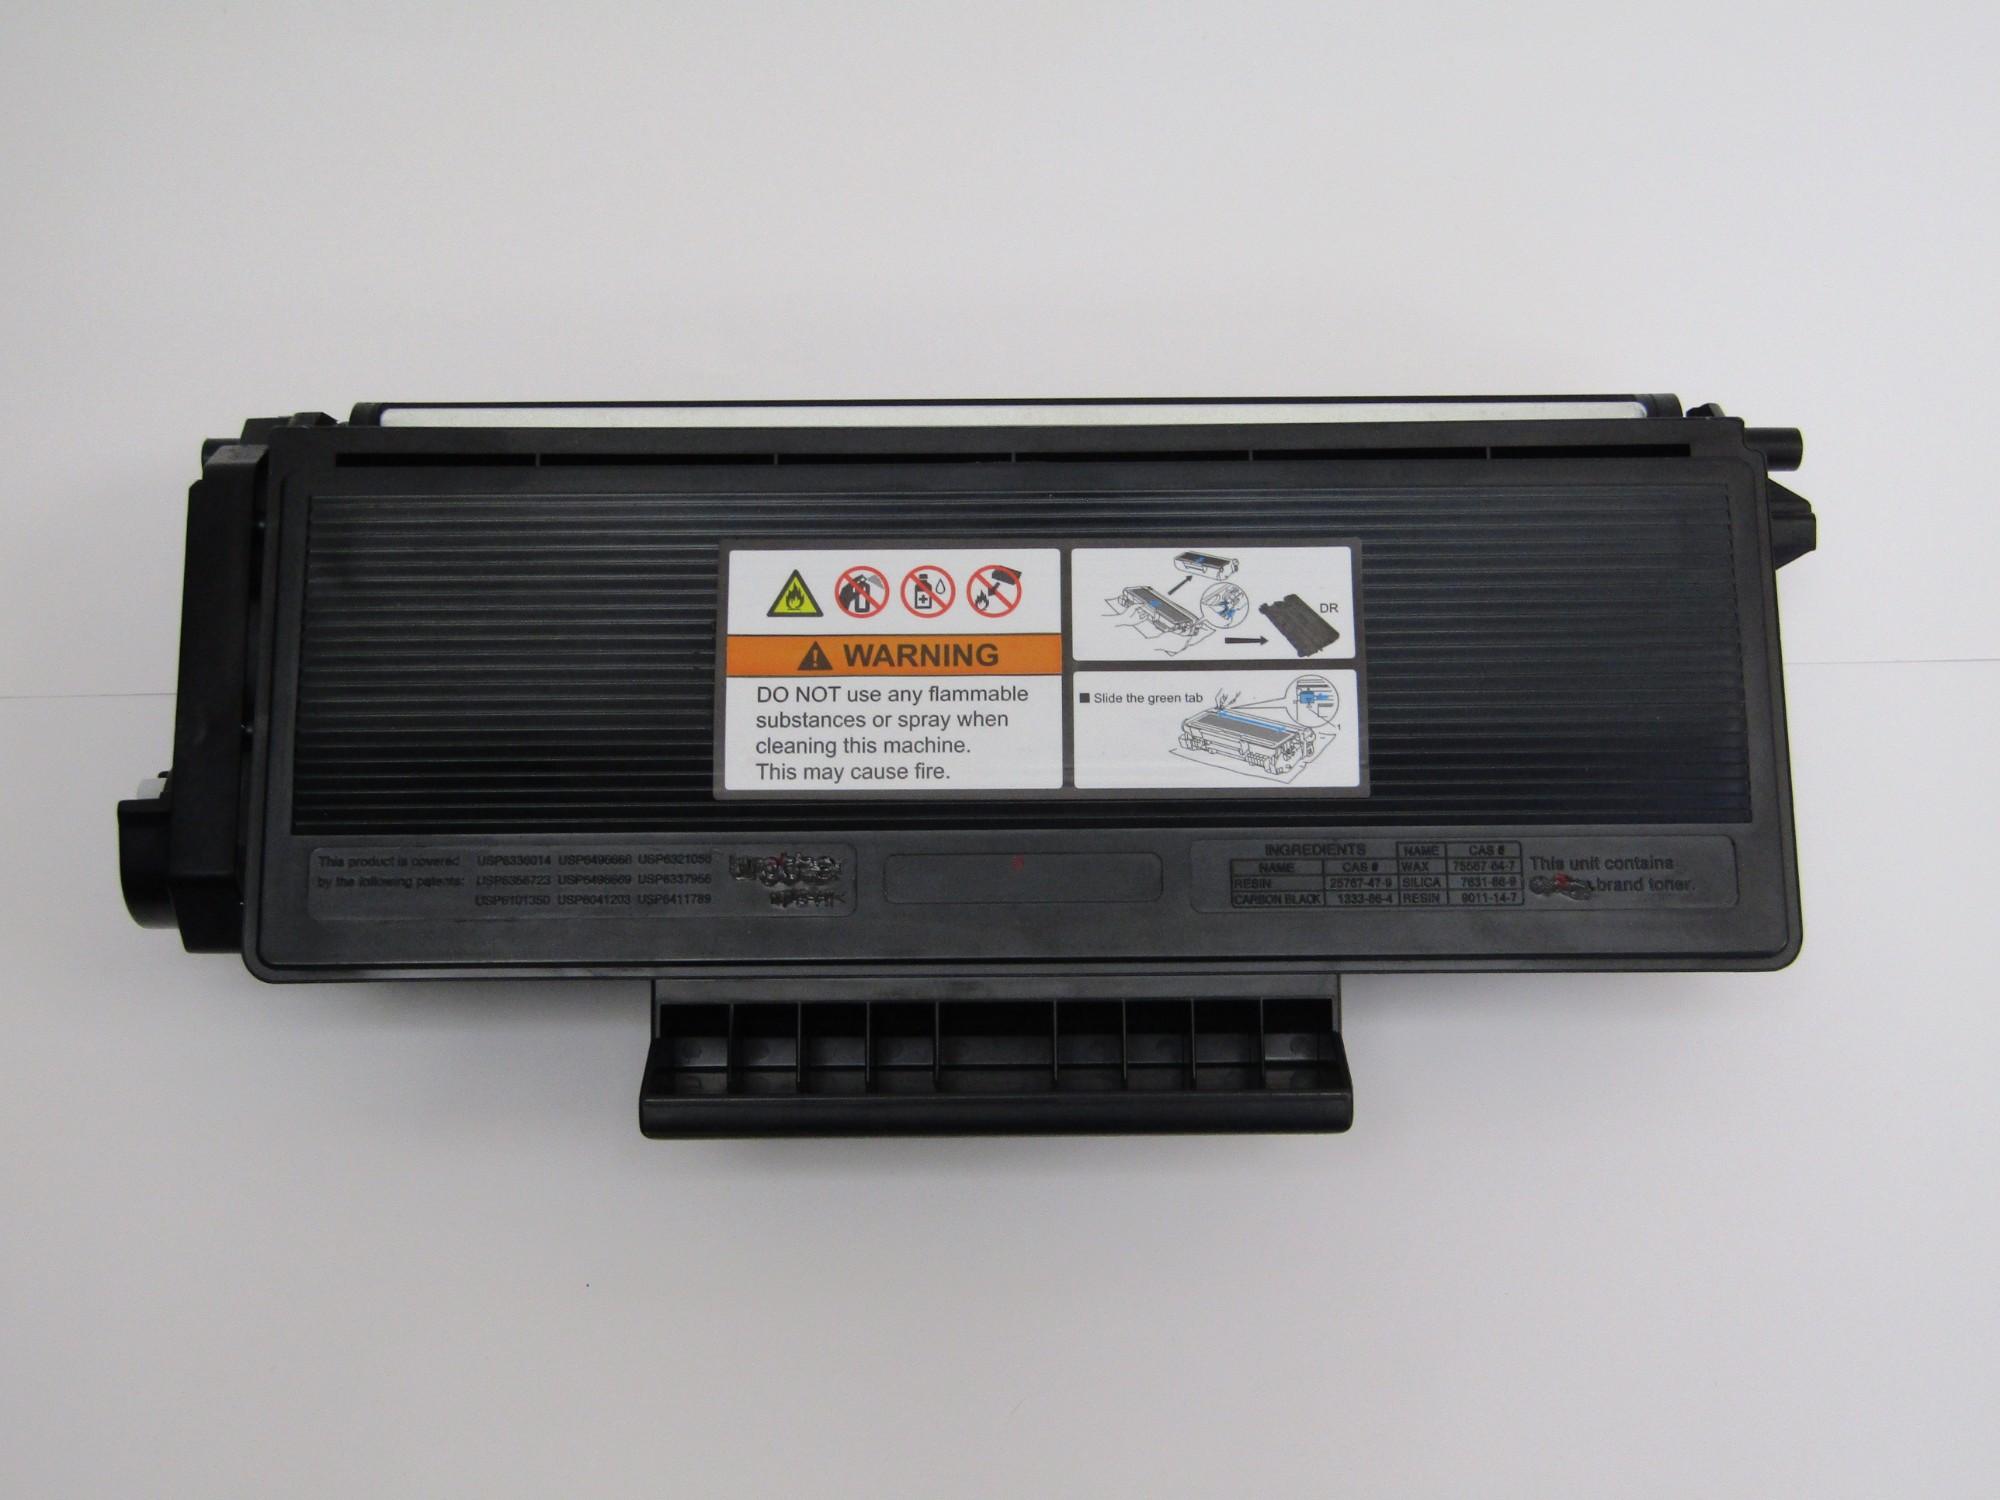 Remanufactured Brother TN3170 Black Toner Cartridge